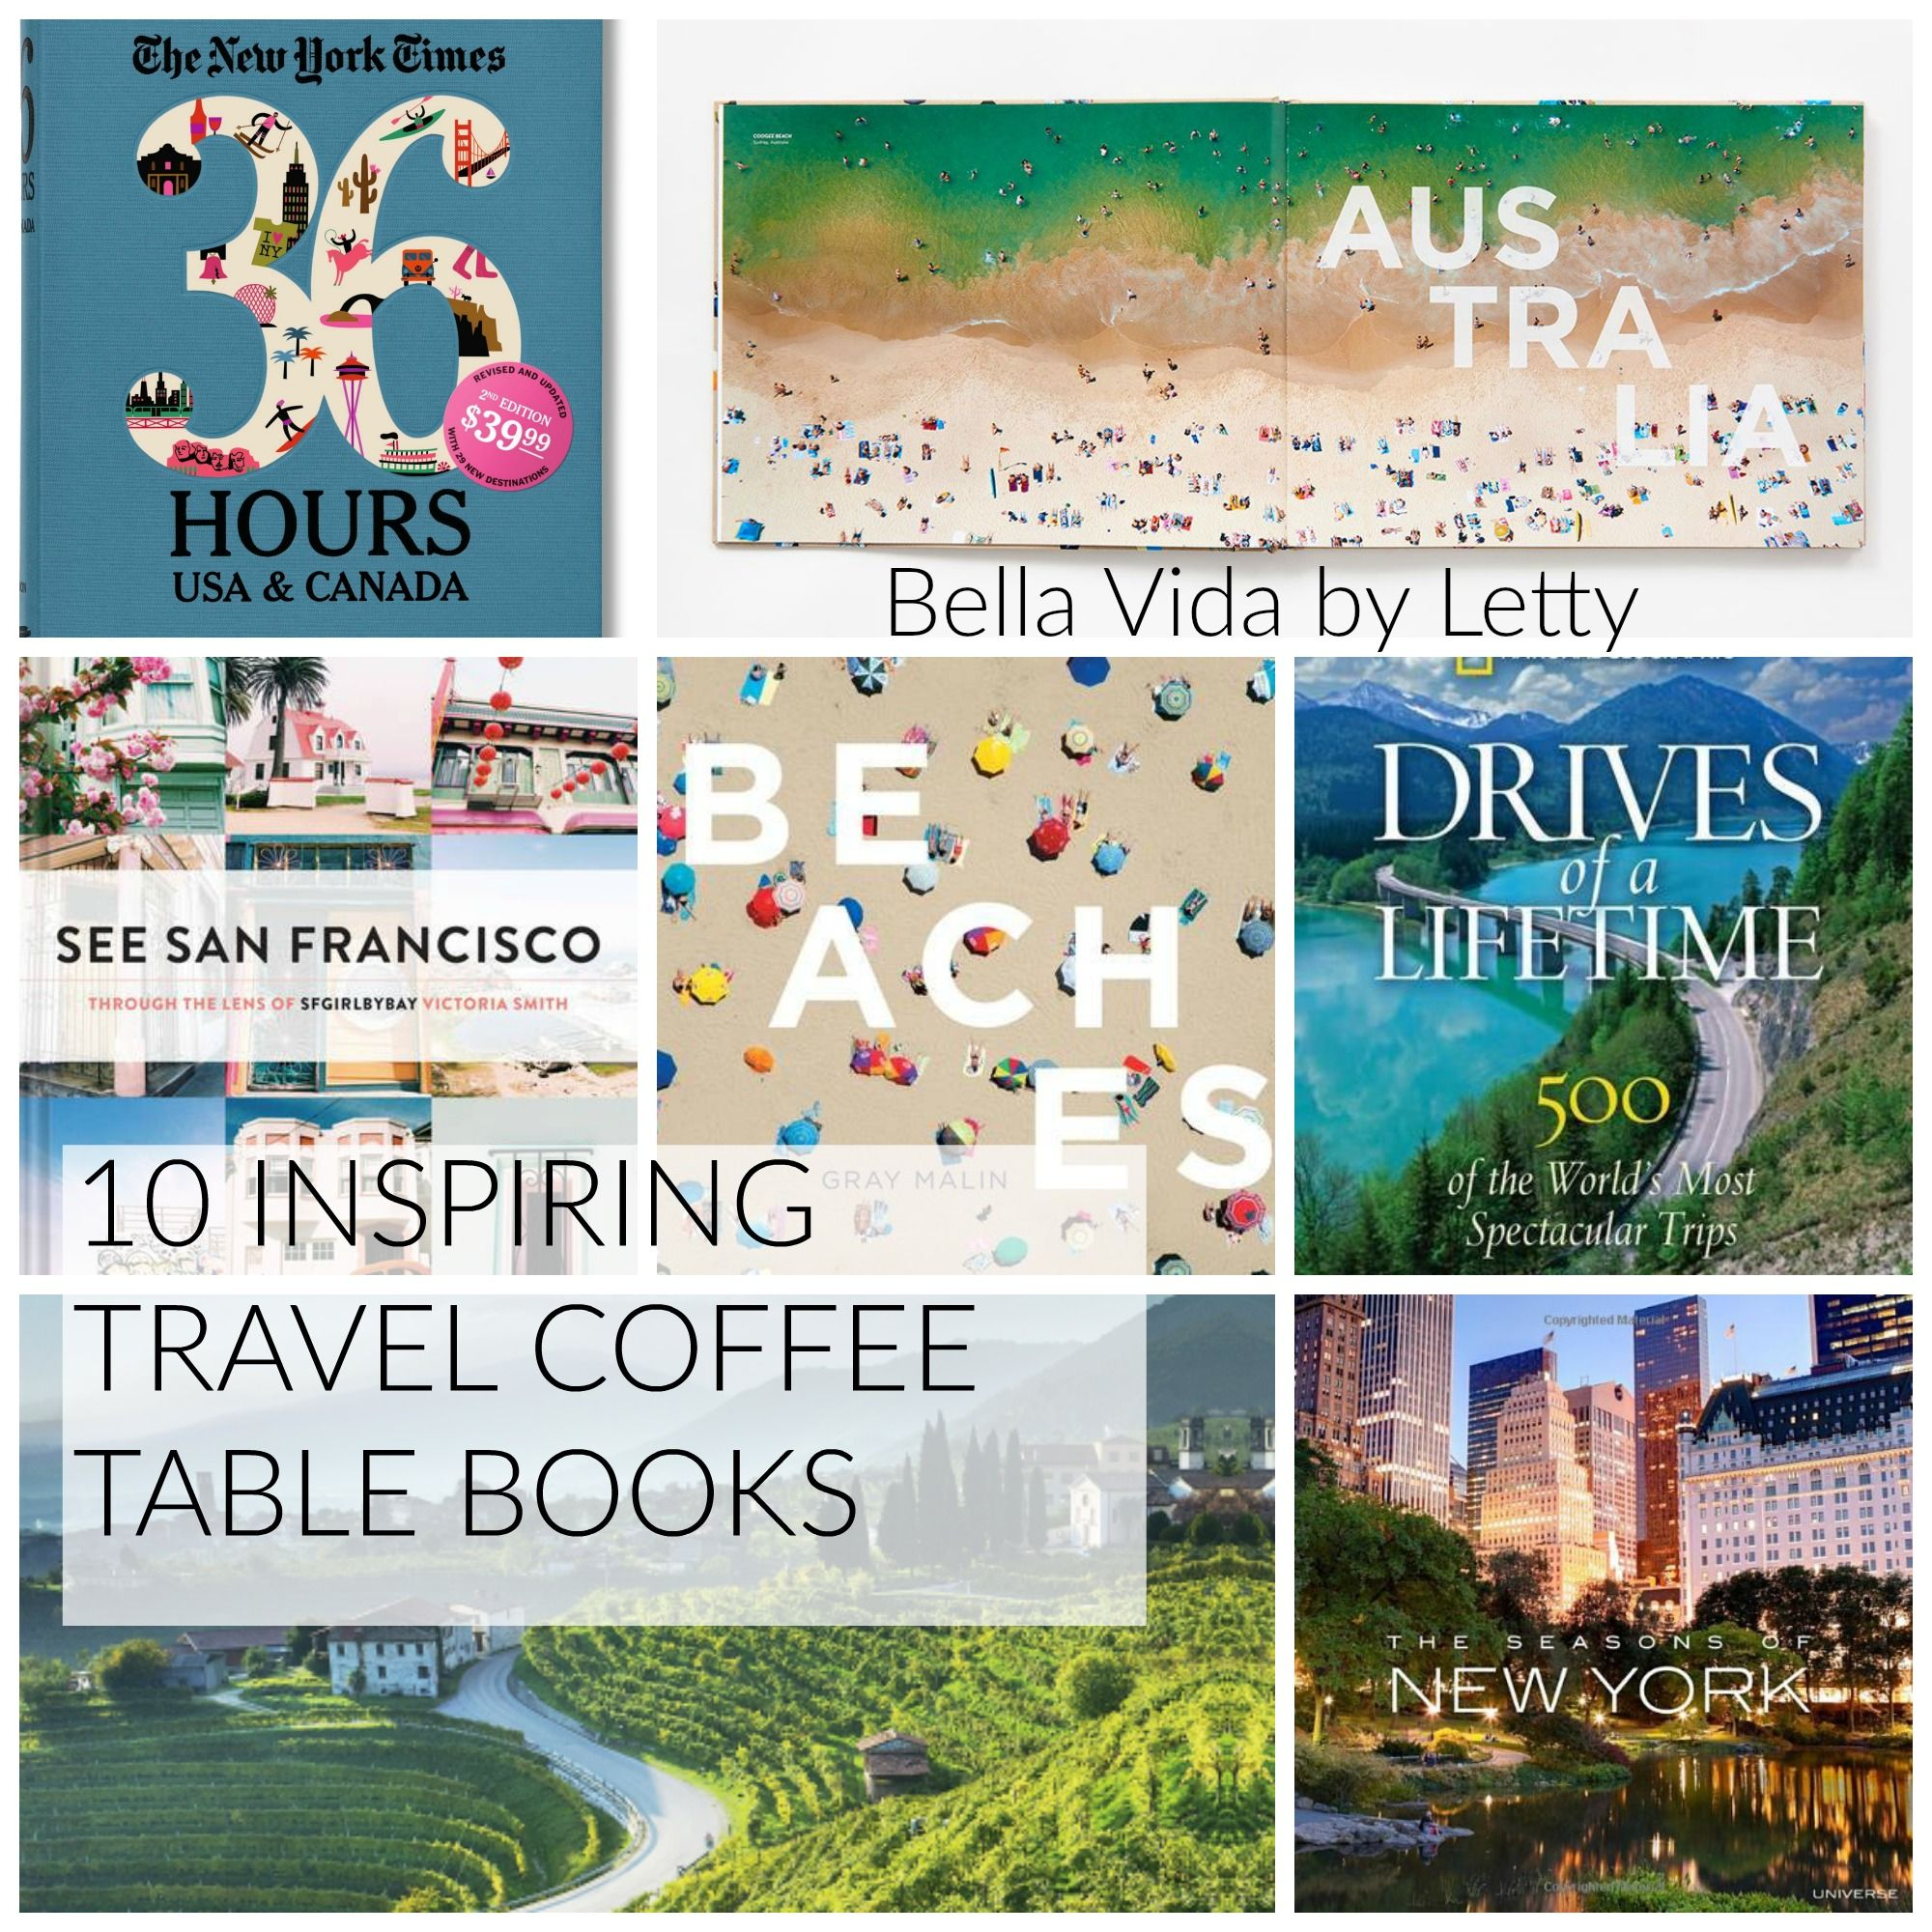 Inspirational Coffee Table Books.10 Inspiring Travel Coffee Table Books Travel Books Coffee Table